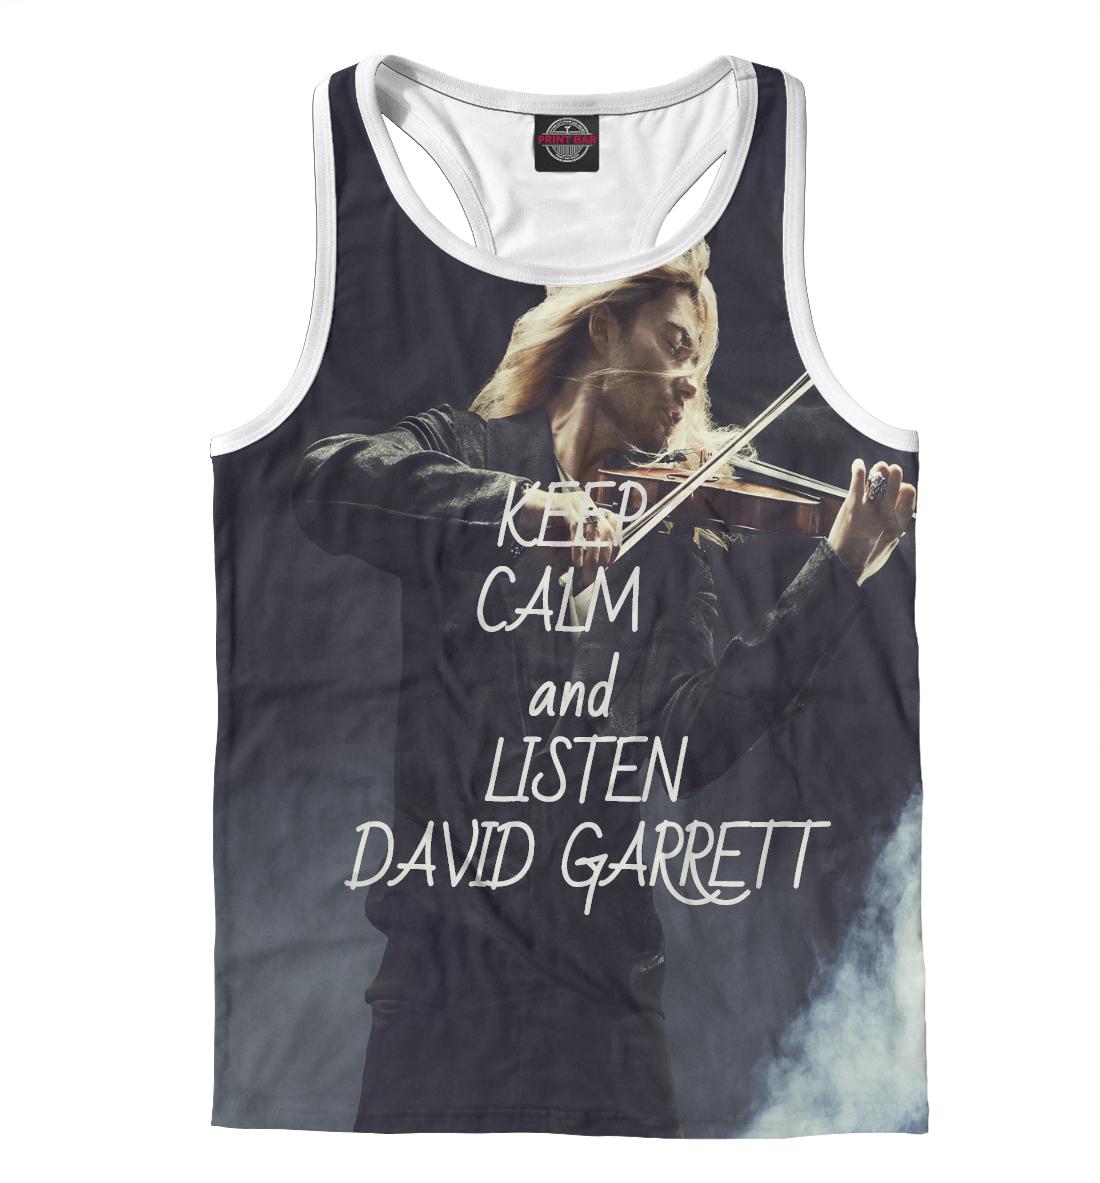 david williams springboks troepies and cadres Keep calm and listen David Garrett